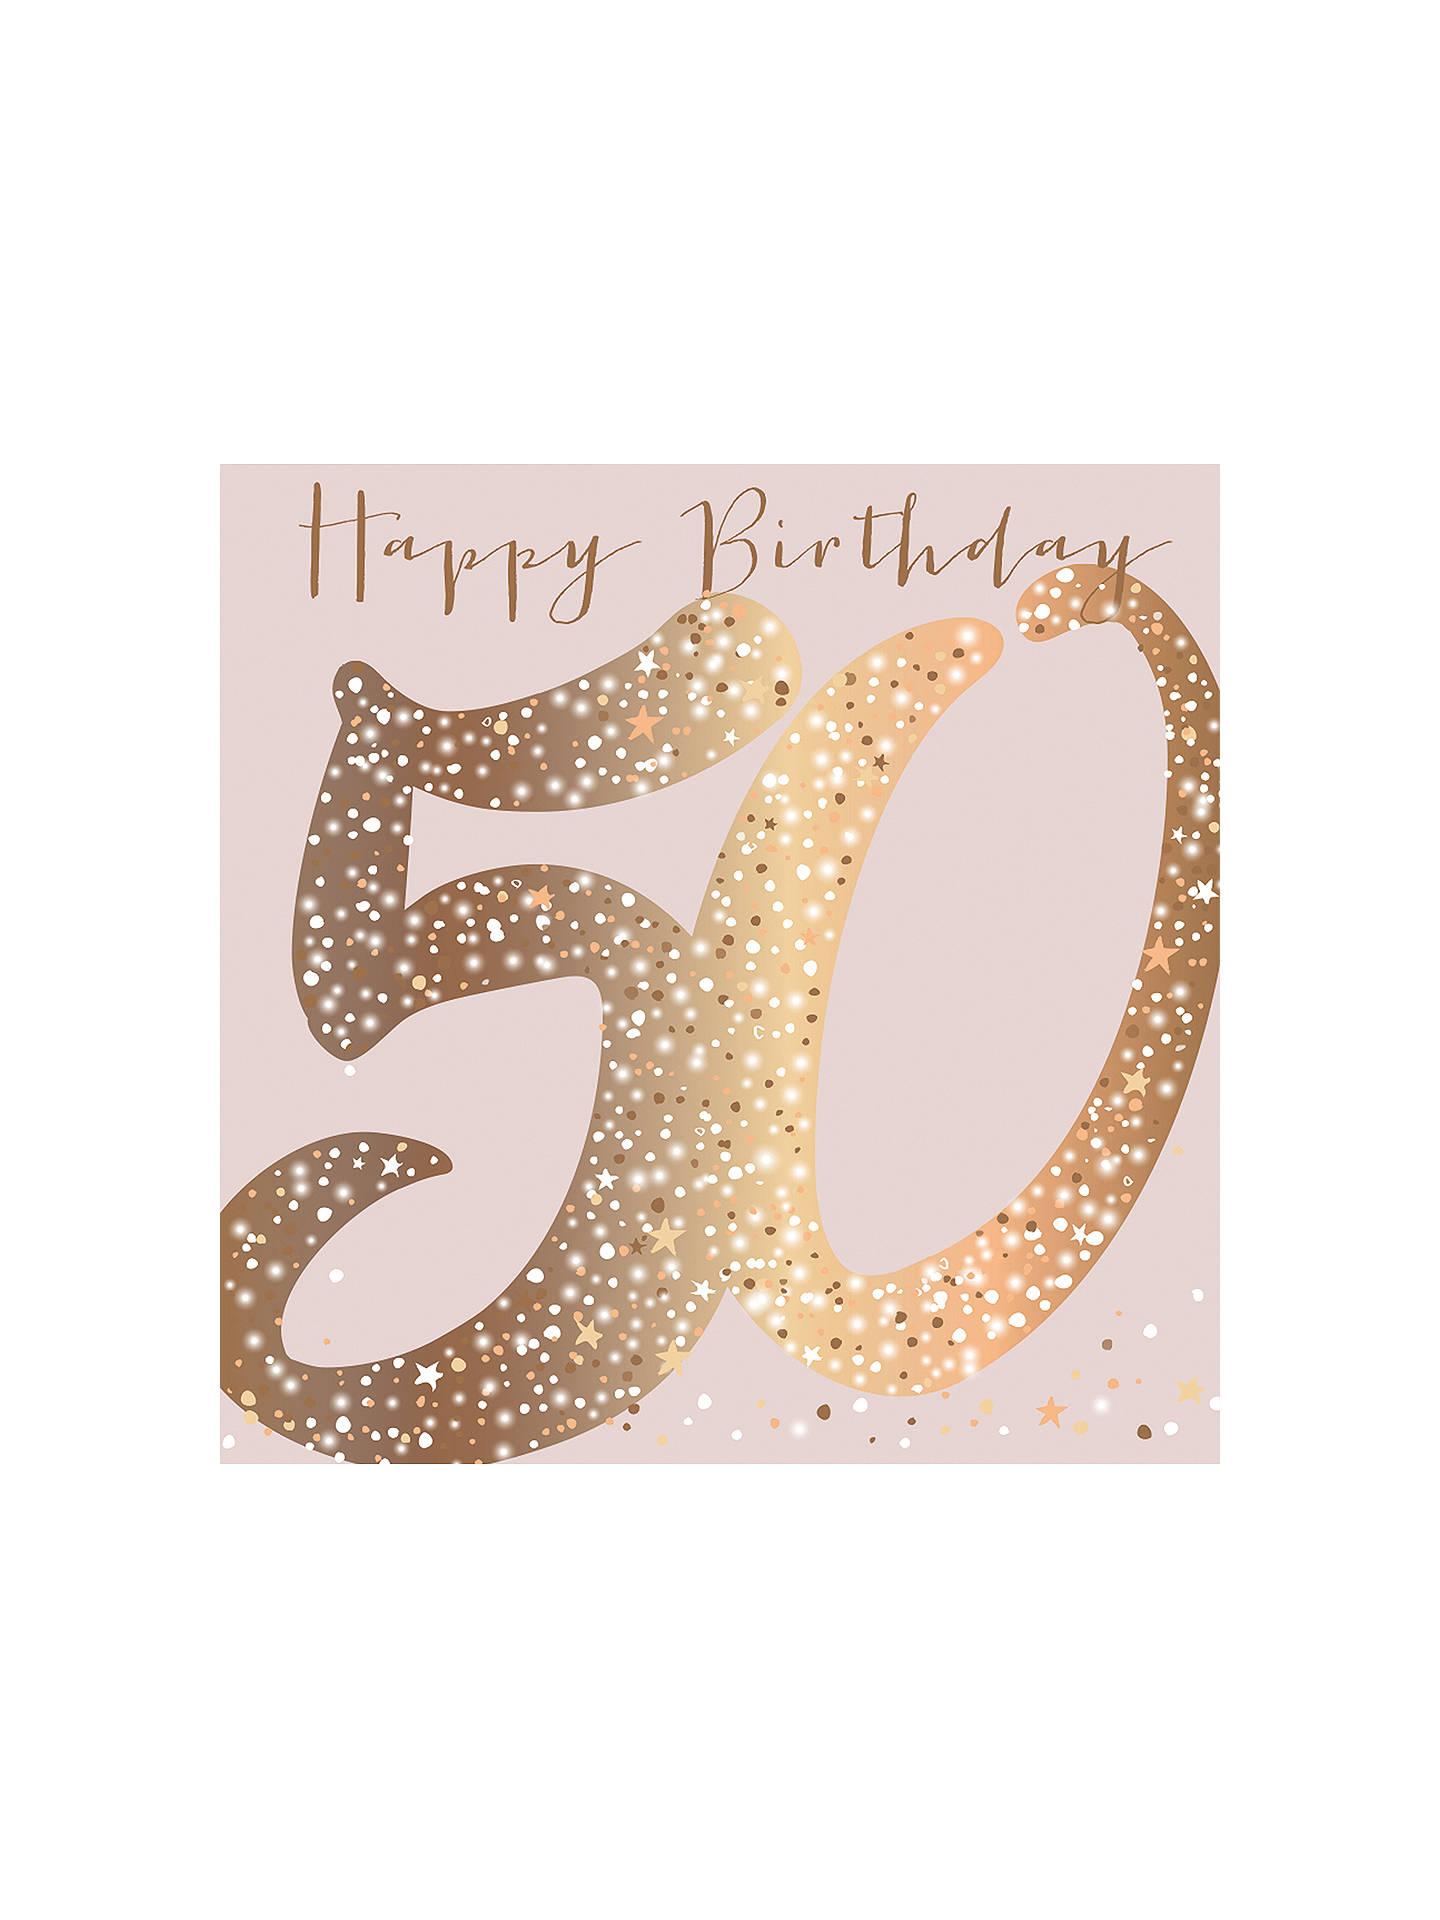 Belly Button Designs 50th Birthday Card